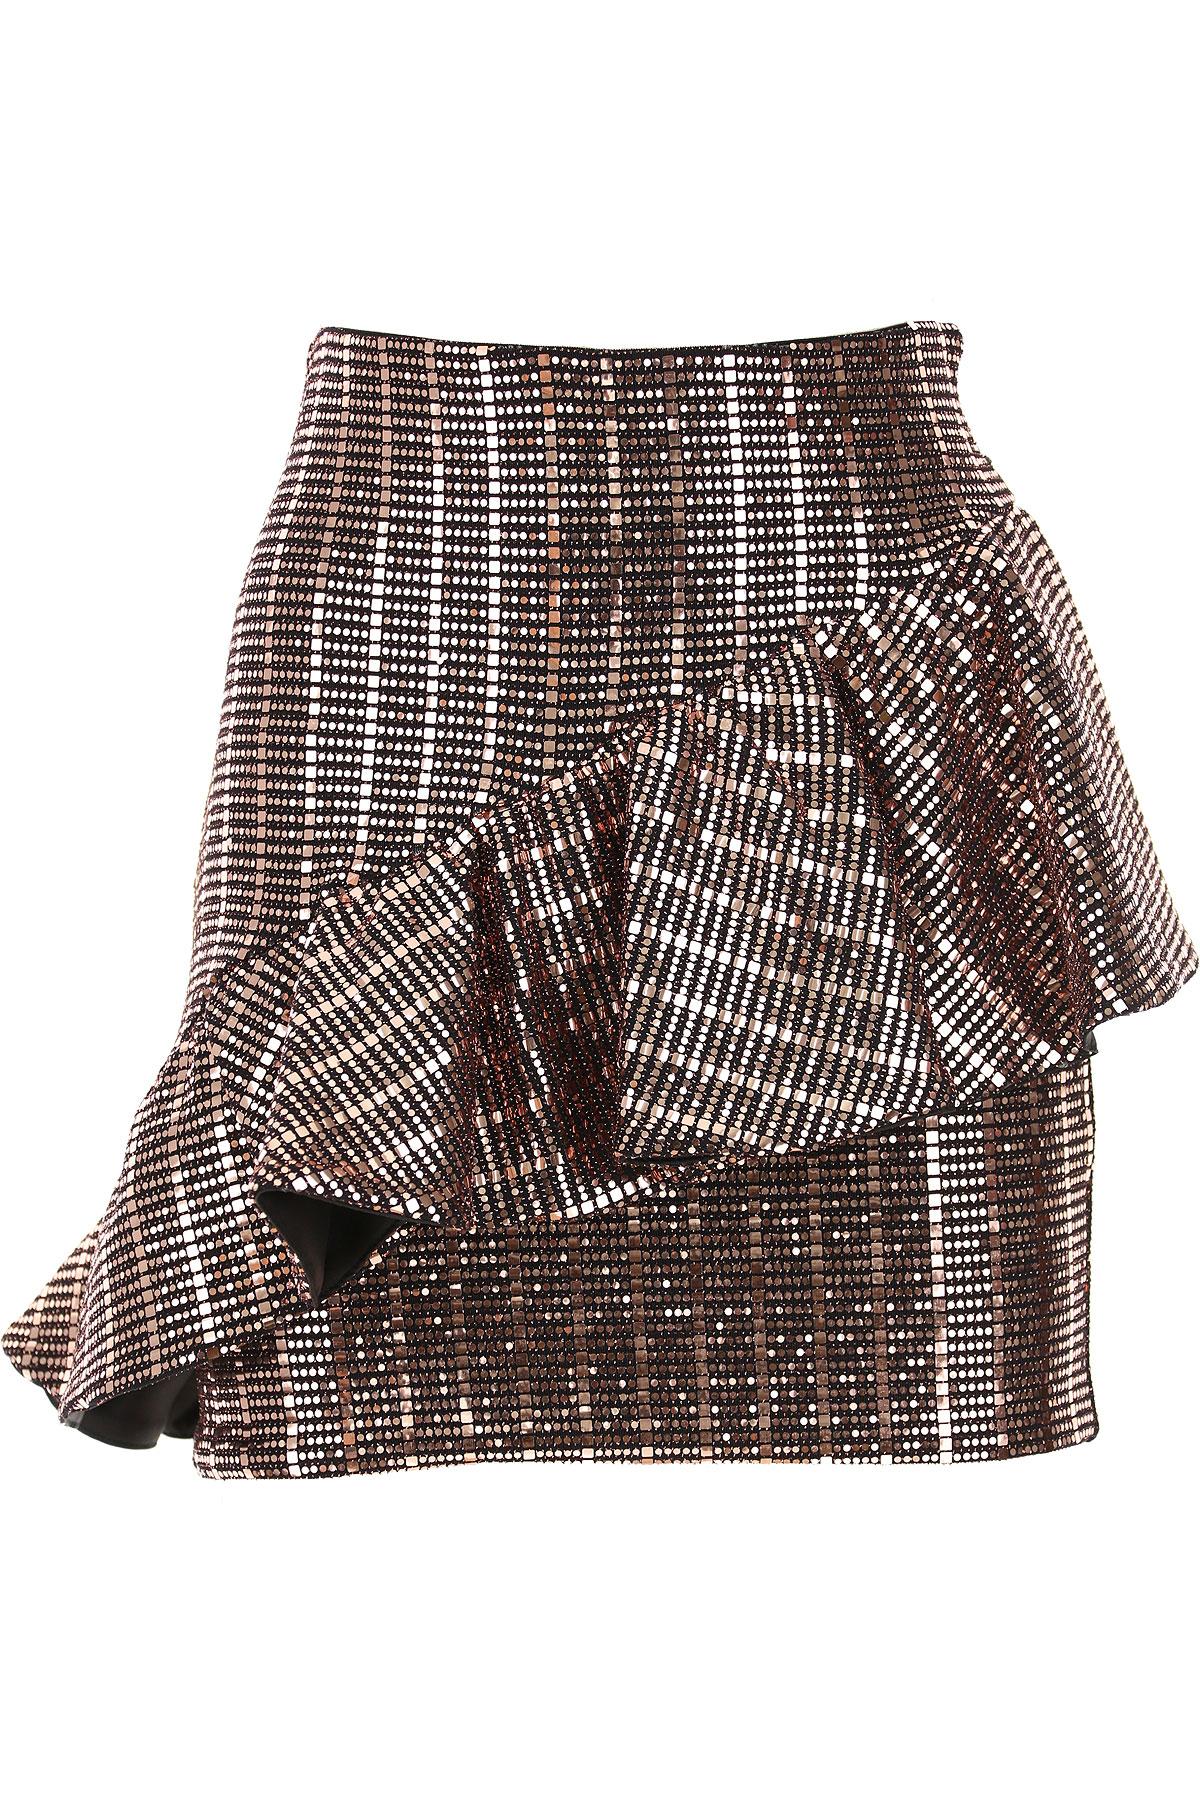 Aniye By Skirt for Women On Sale, Black, polyamide, 2019, 4 6